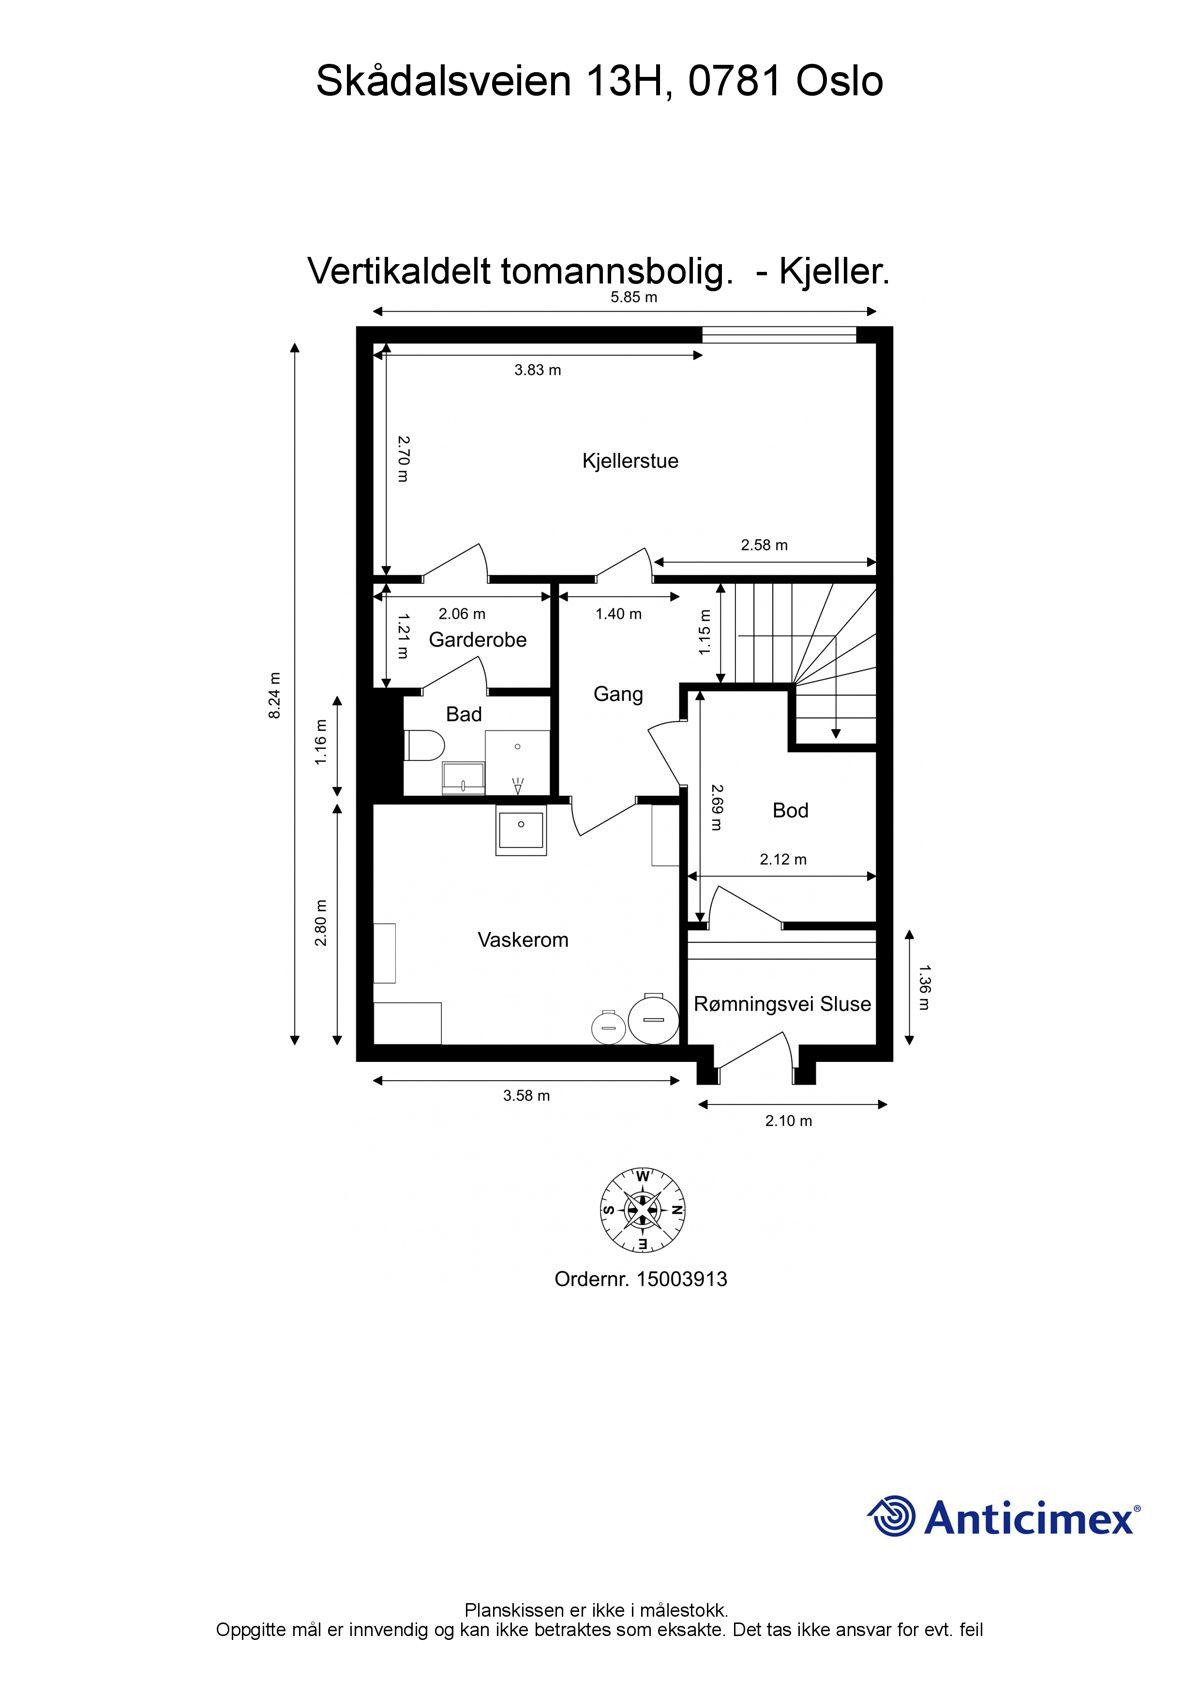 Skådalsveien 13H Plantegning - U. etasje.